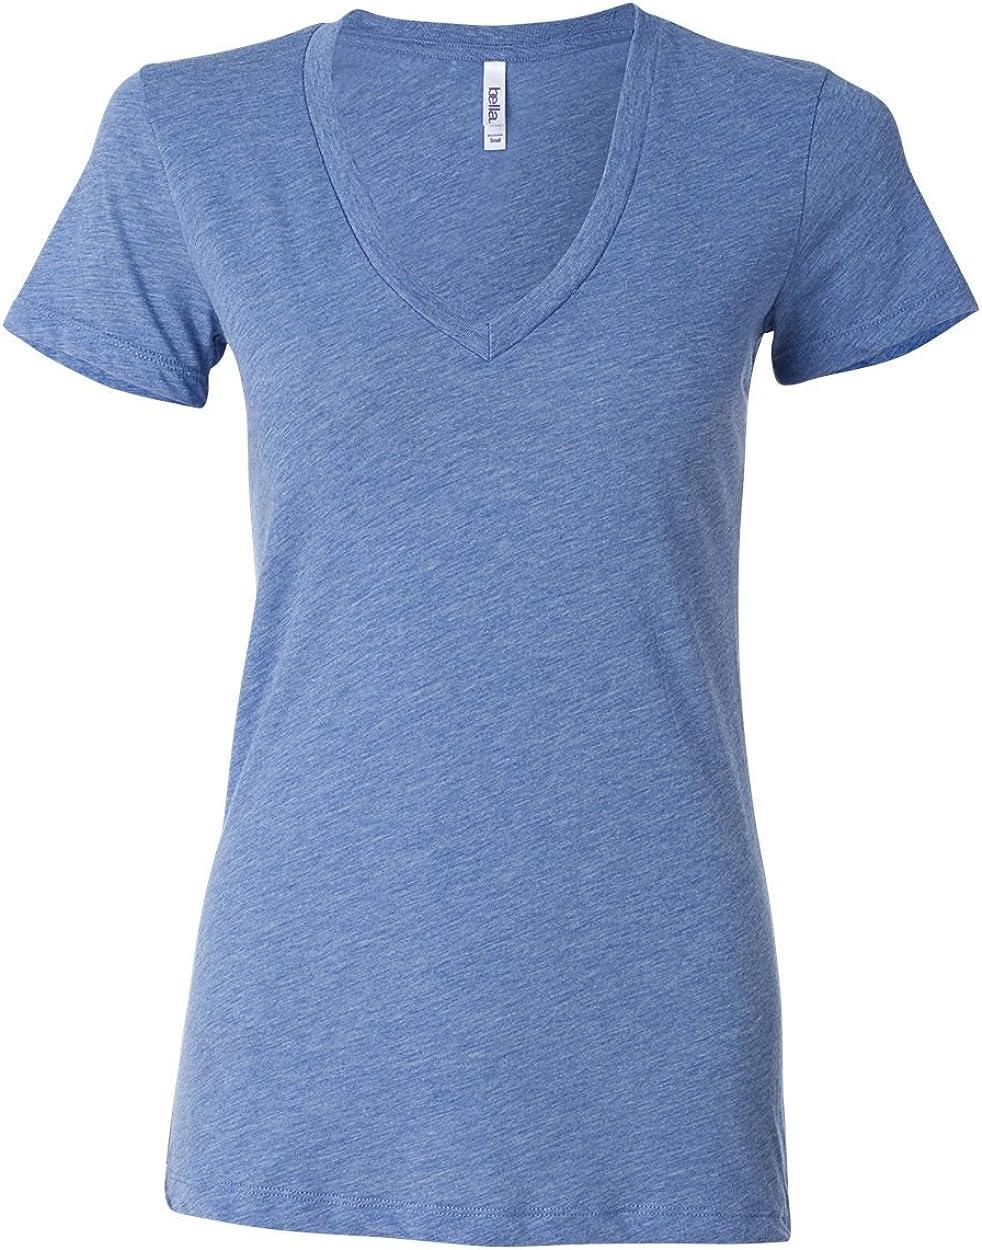 Bella + Canvas Ladies Triblend Deep V-Neck T-Shirt